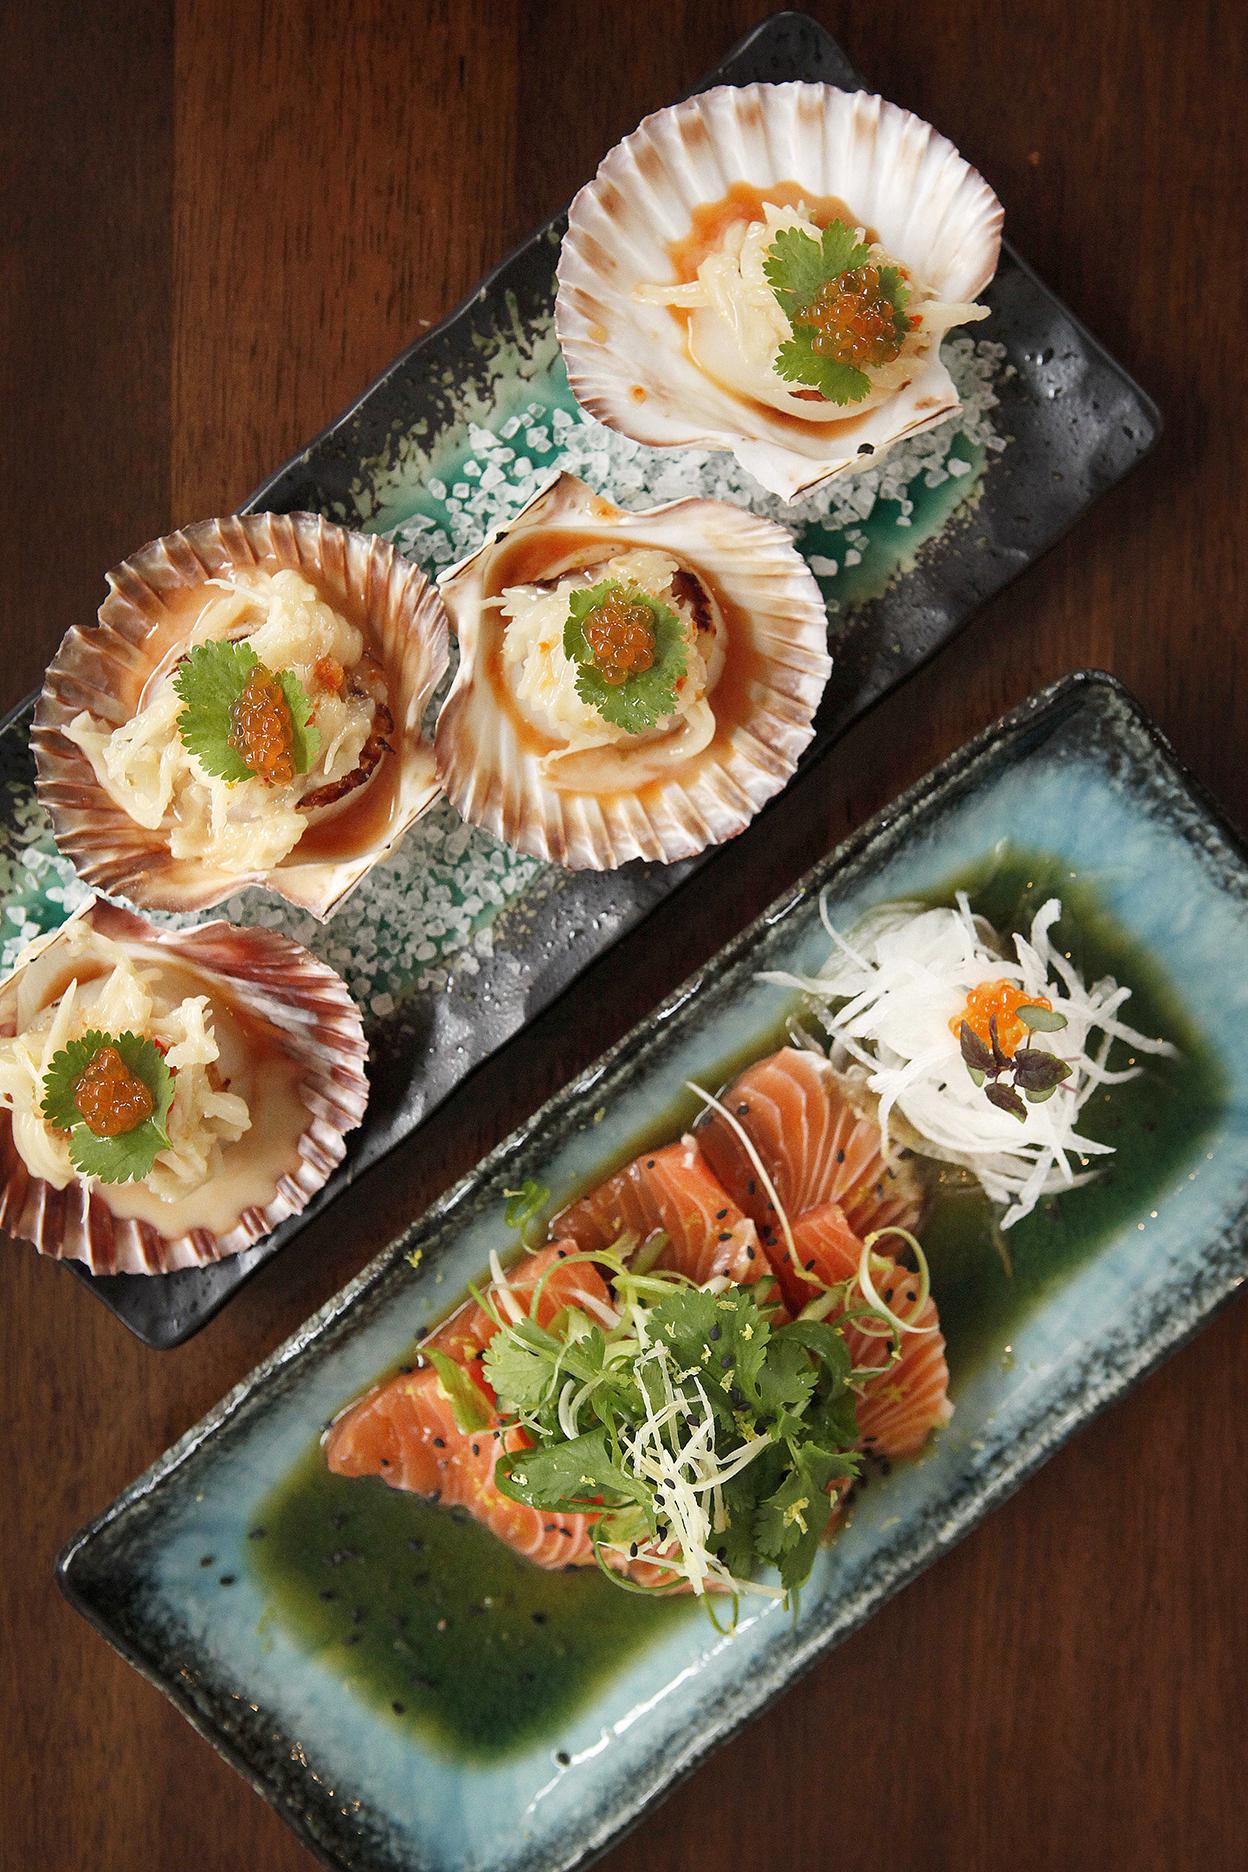 CHP_Export_119017229_82 Thai Cafe 82 on Grange Rd Grange %5BPIC%5D Grilled scallops with coconut sambal.jpg